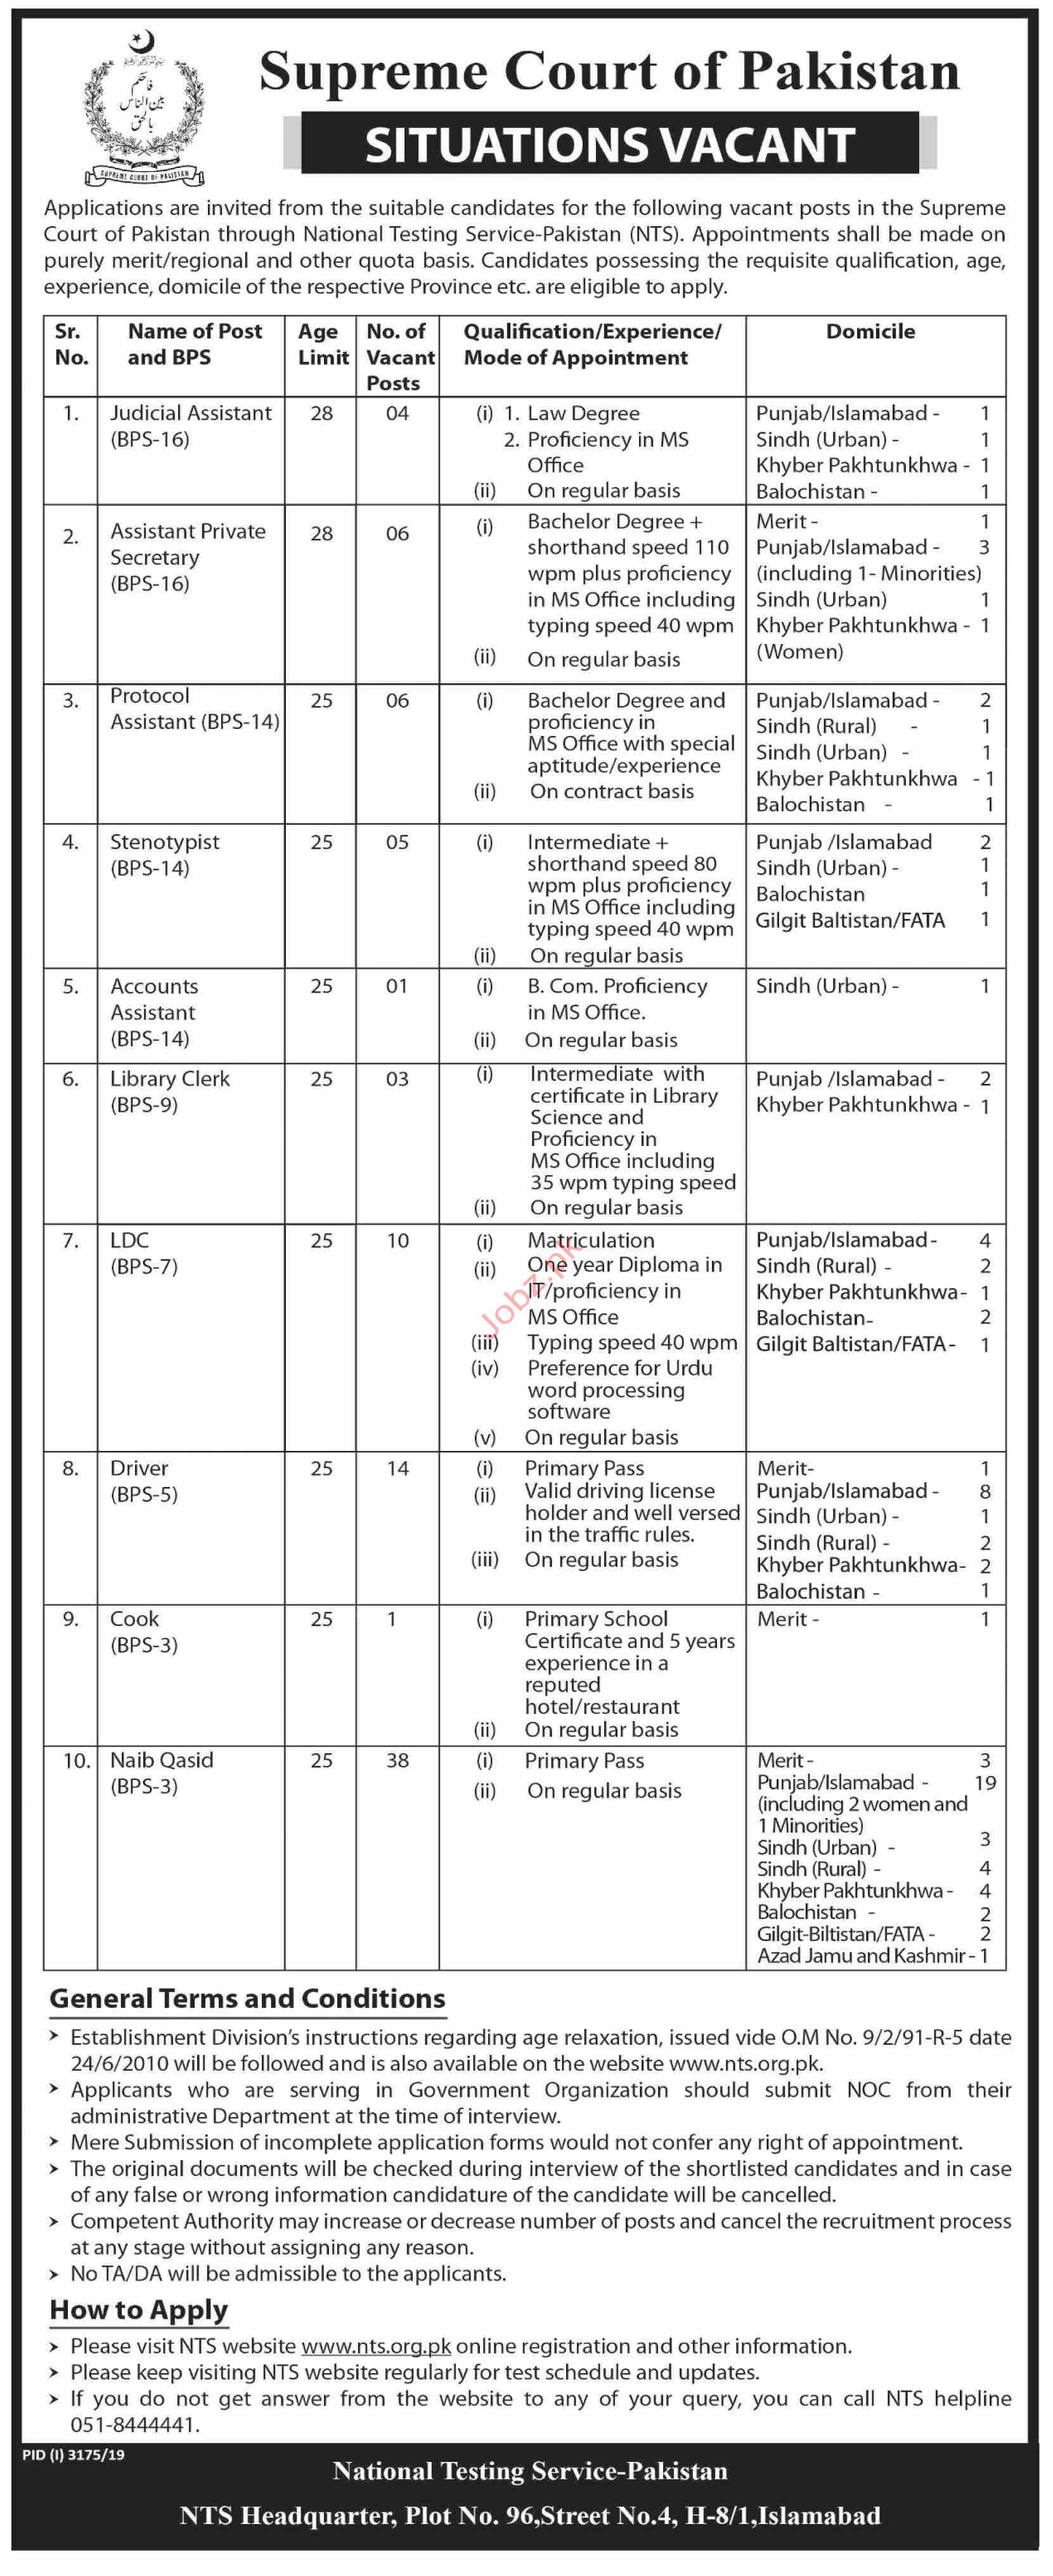 Supreme Court of Pakistan Islamabad Jobs 2020 Via NTS